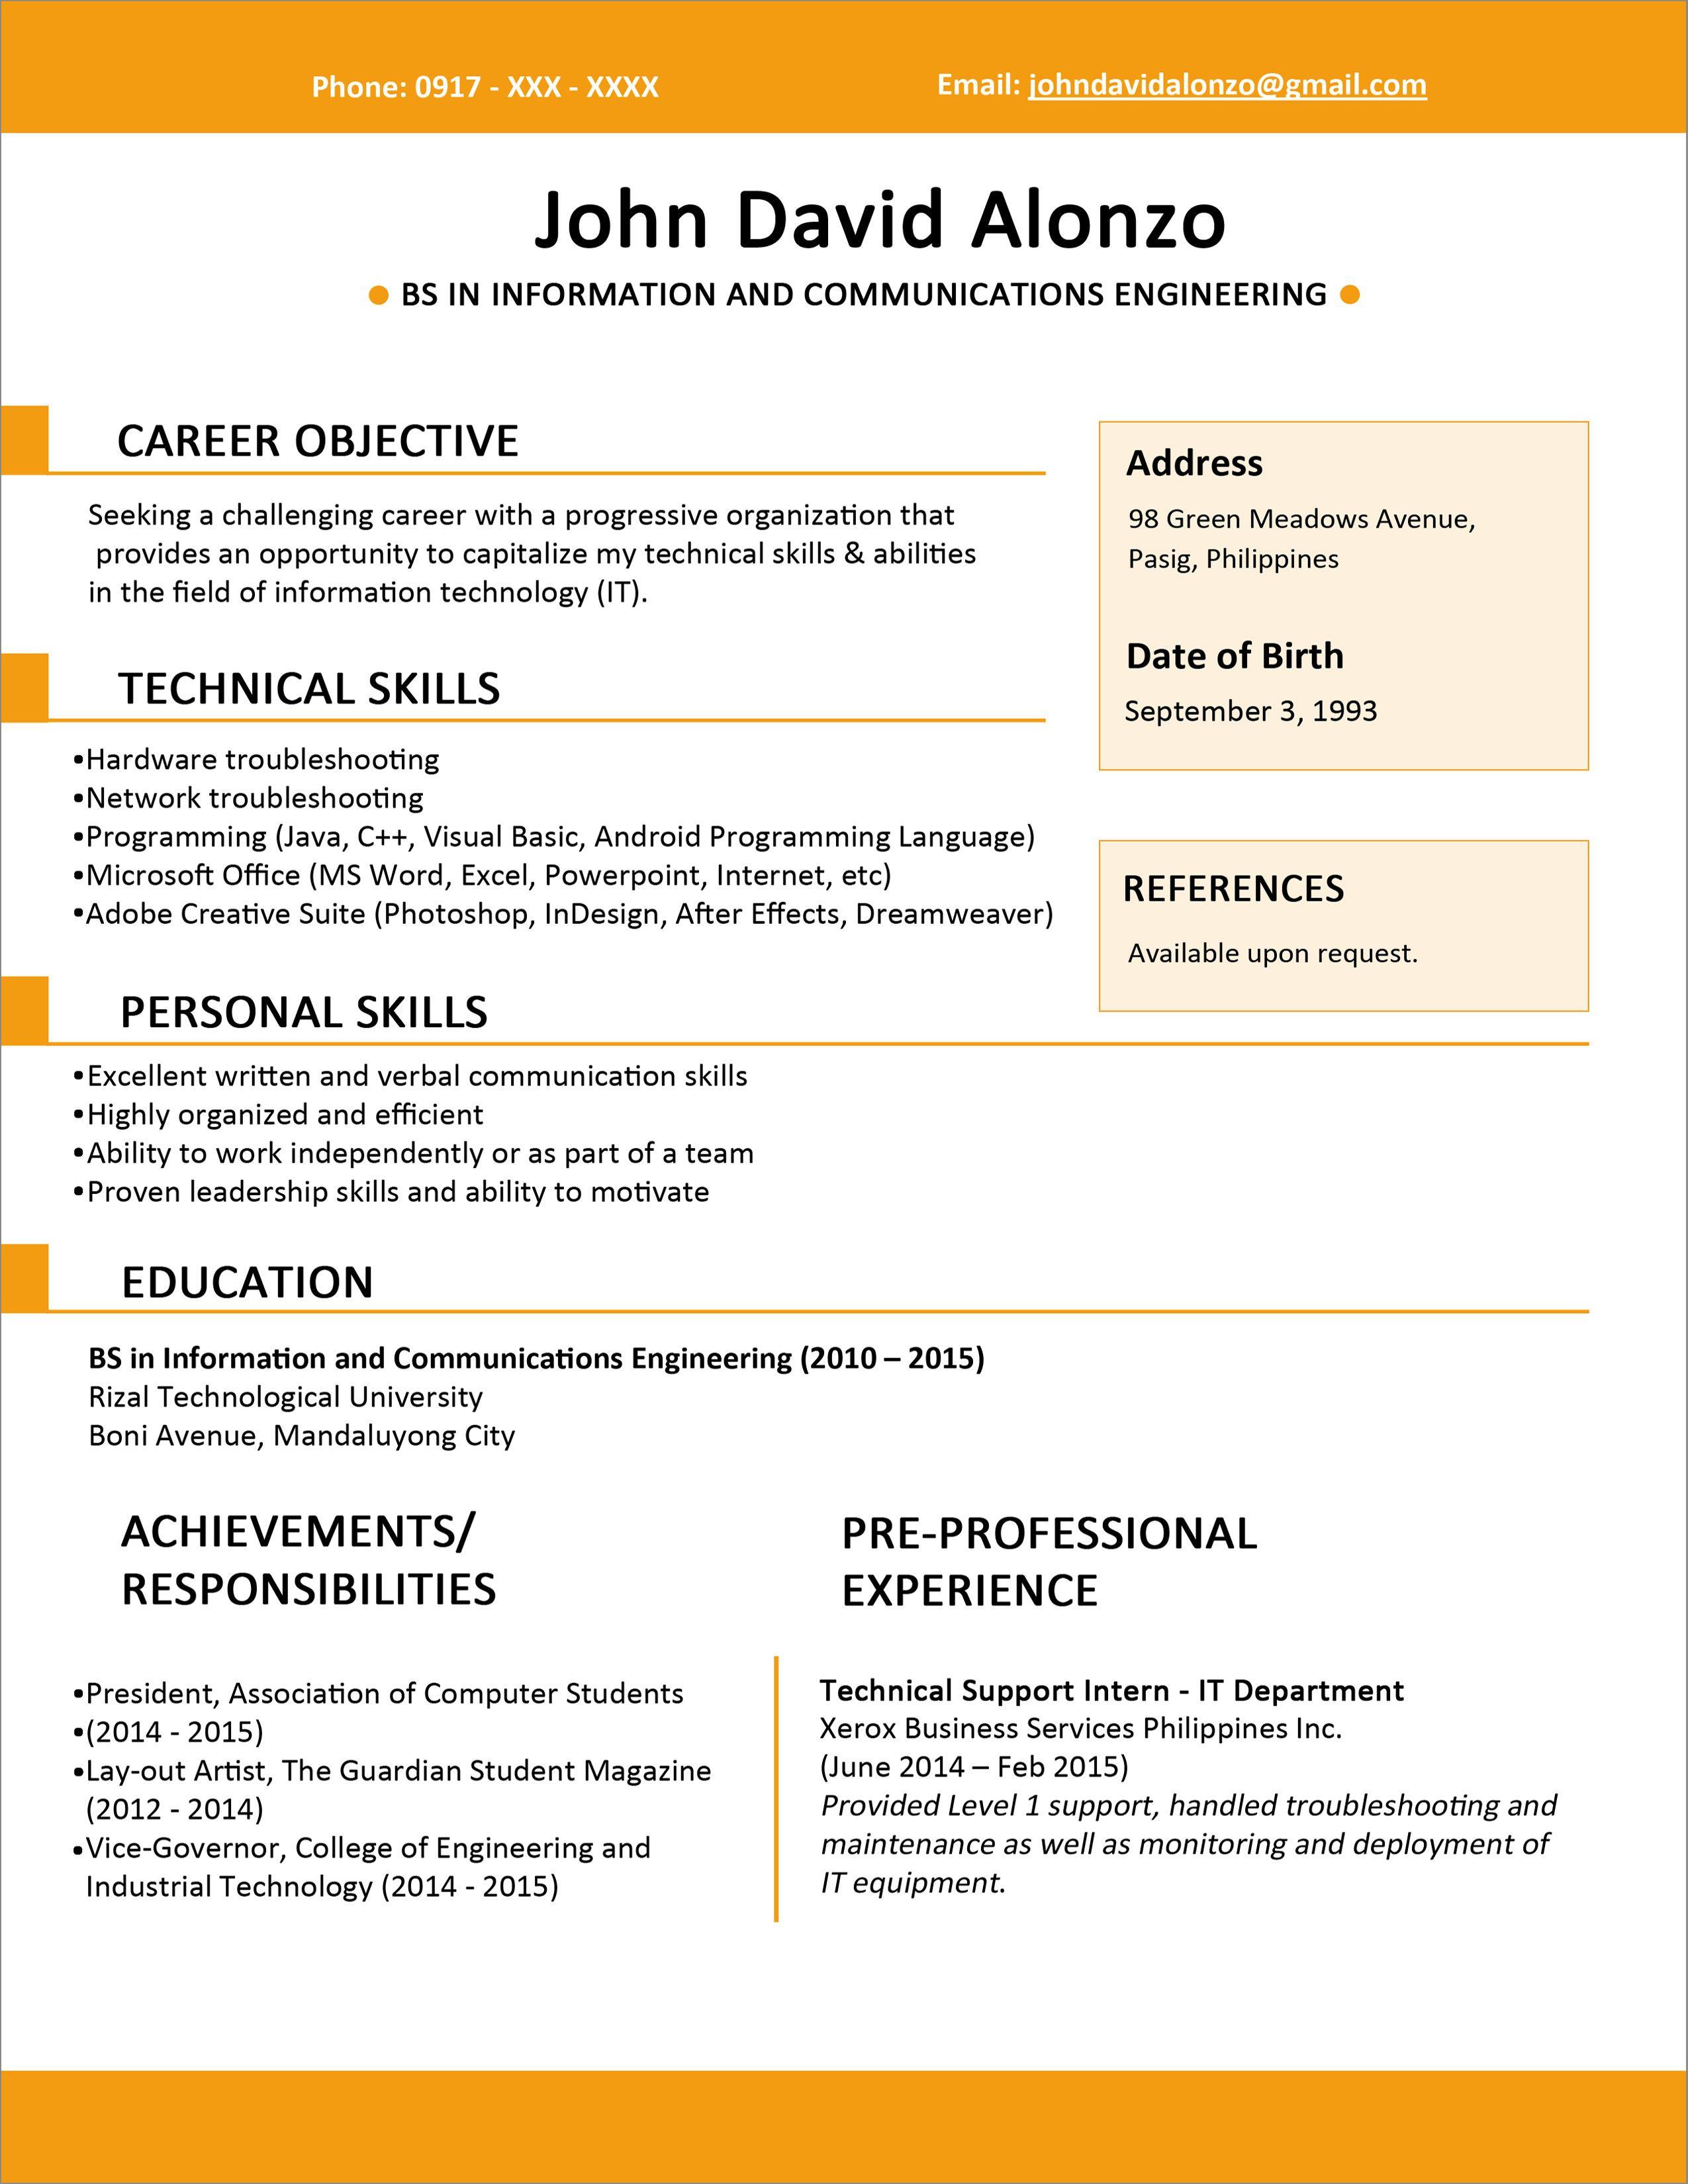 sample resume format fresh graduates single page Innovativ